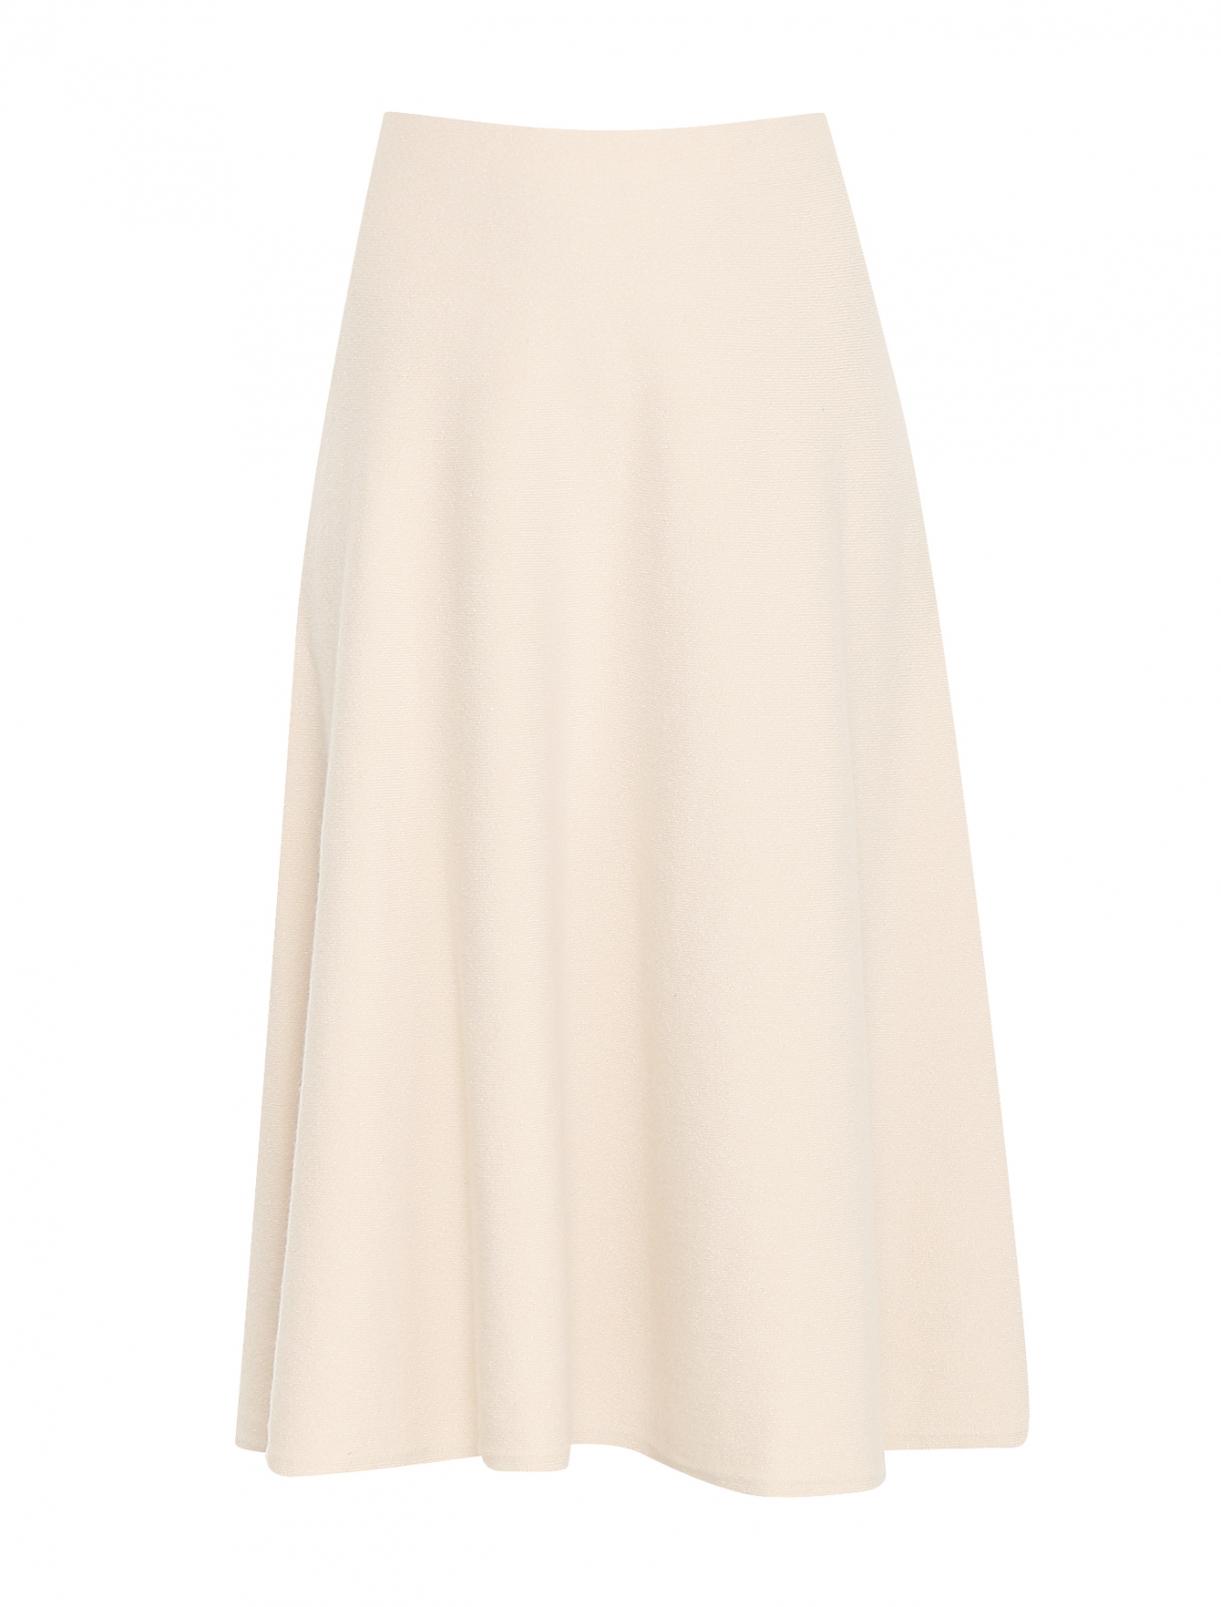 Трикотажная юбка-миди из шерсти Weekend Max Mara  –  Общий вид